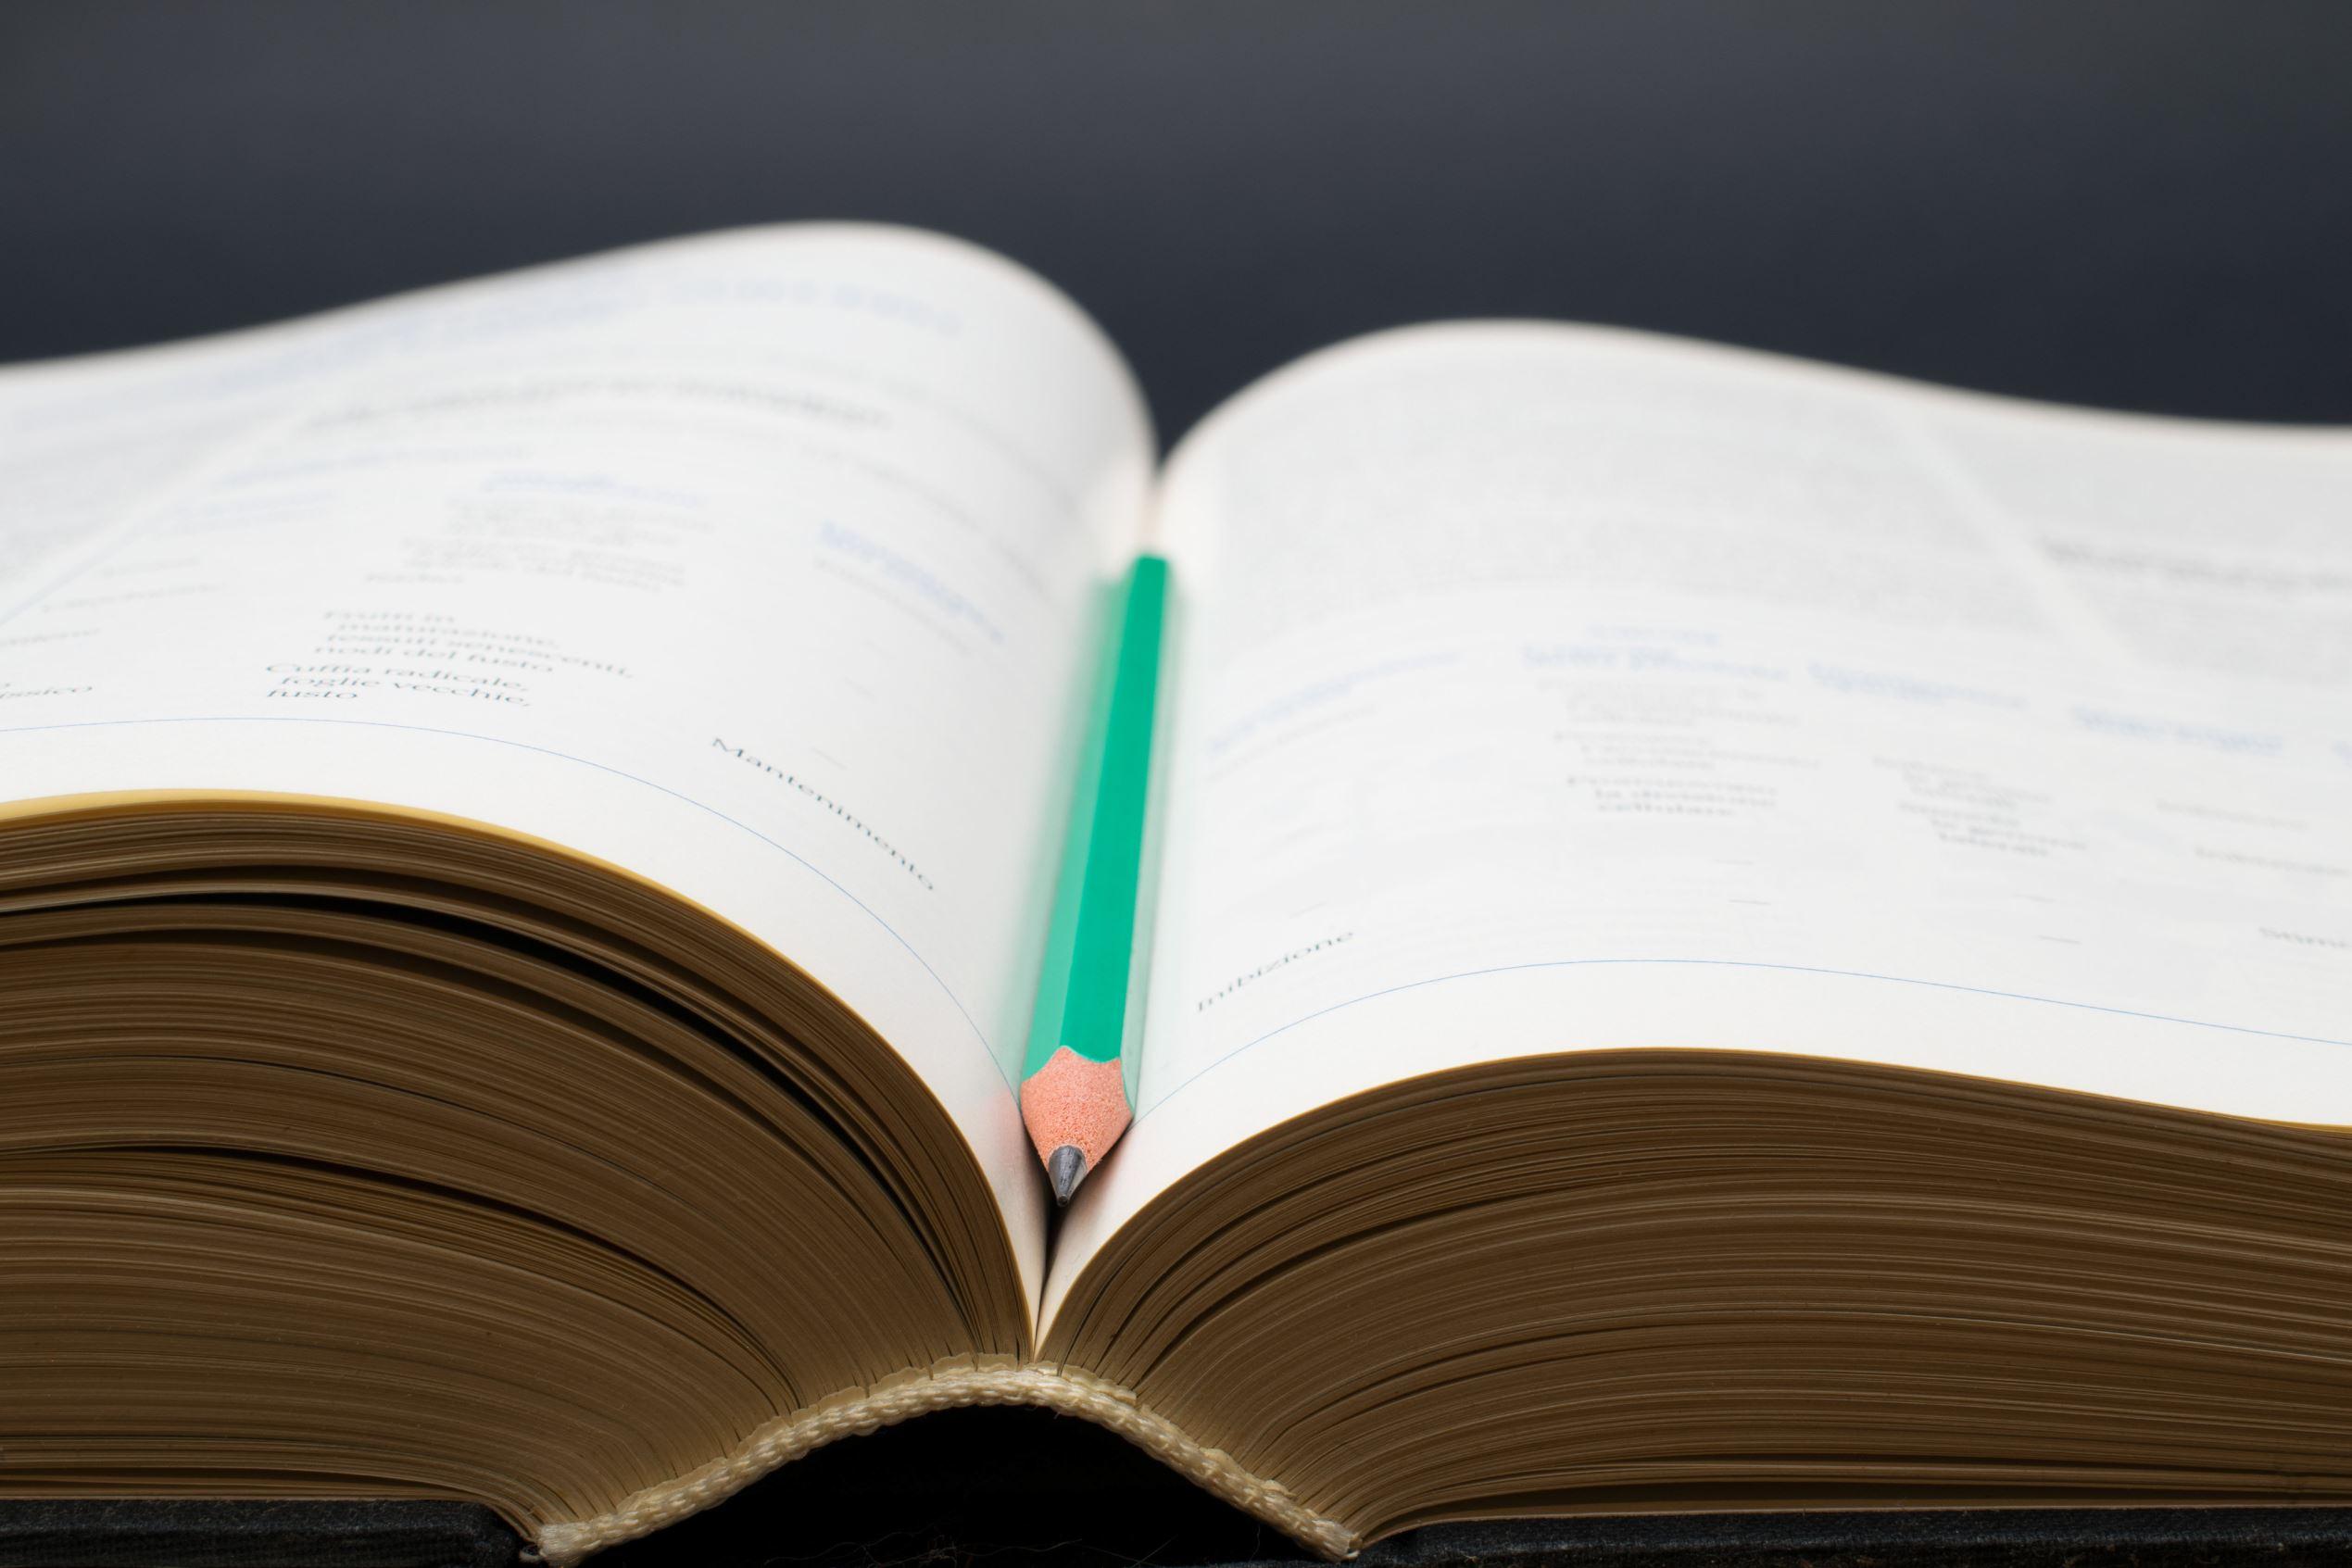 Dating tilbake synonymordbok